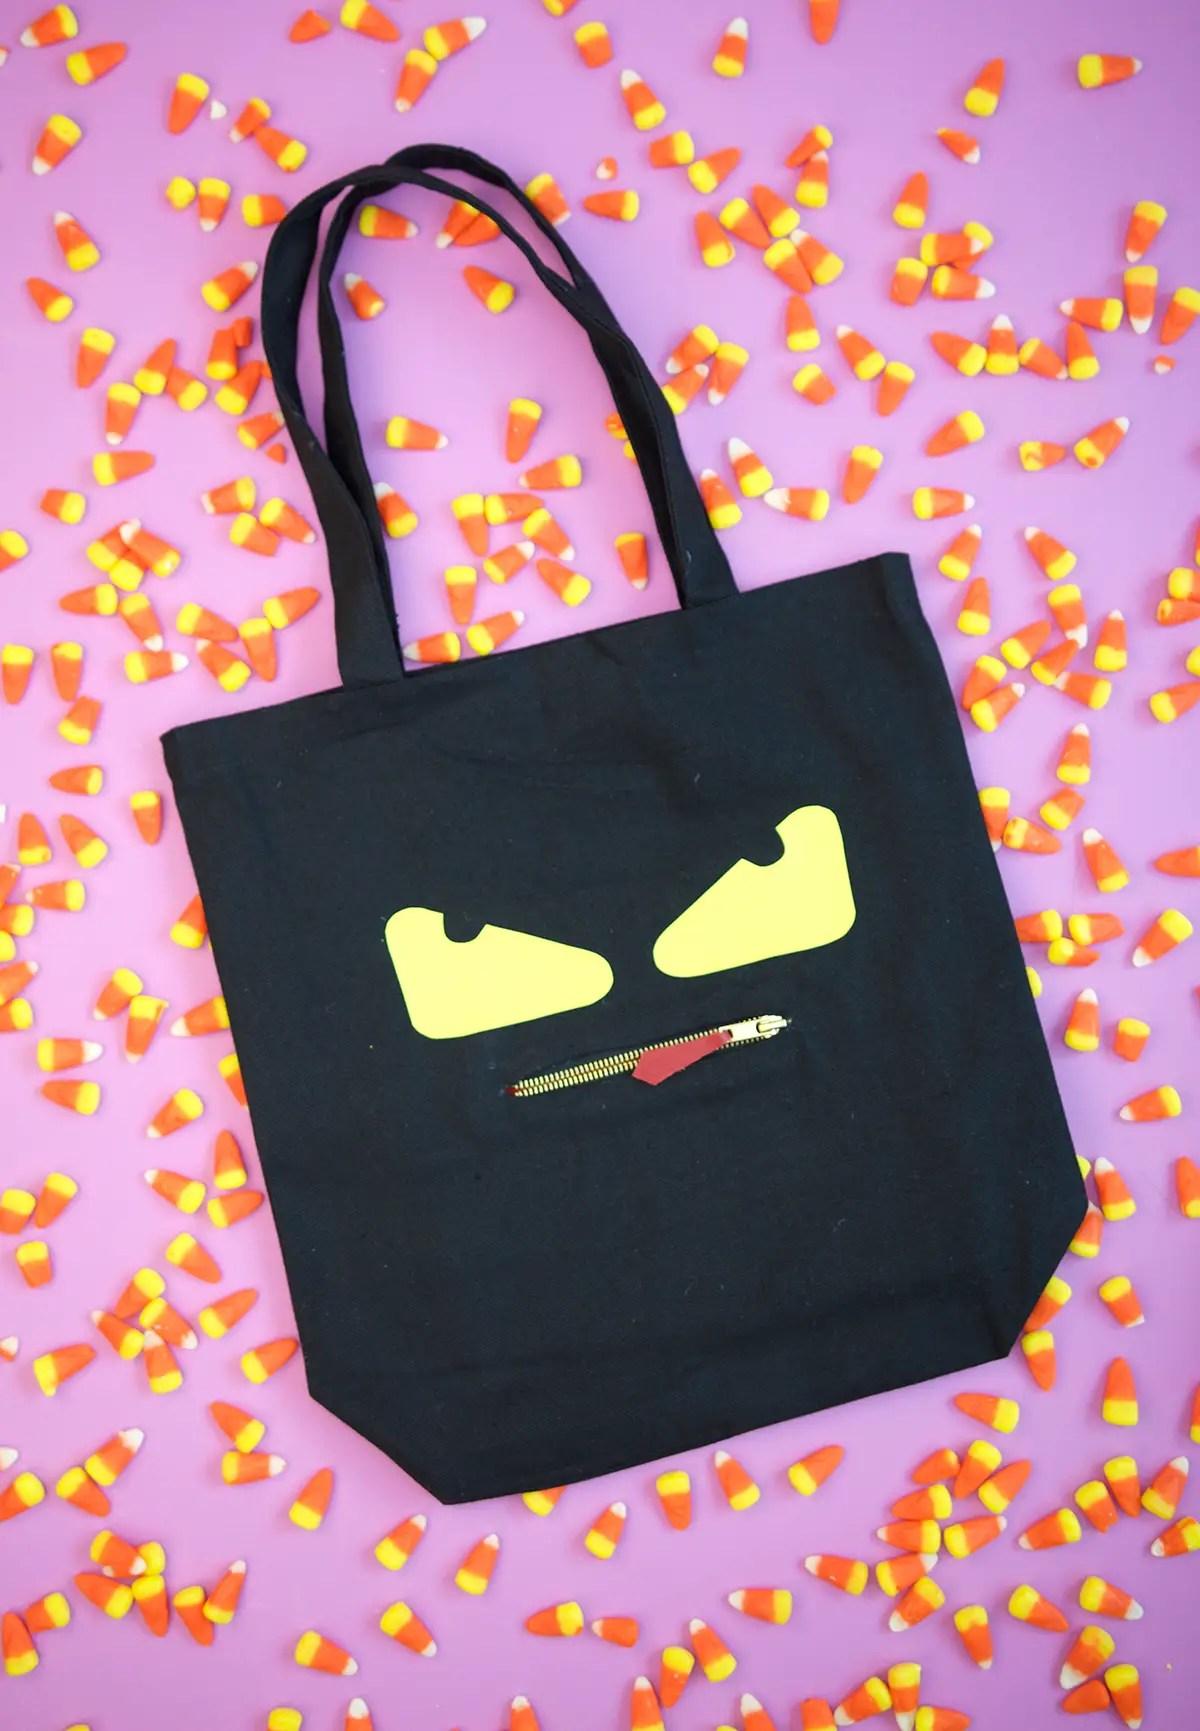 22 Amazing DIY Tote Bags Ideas